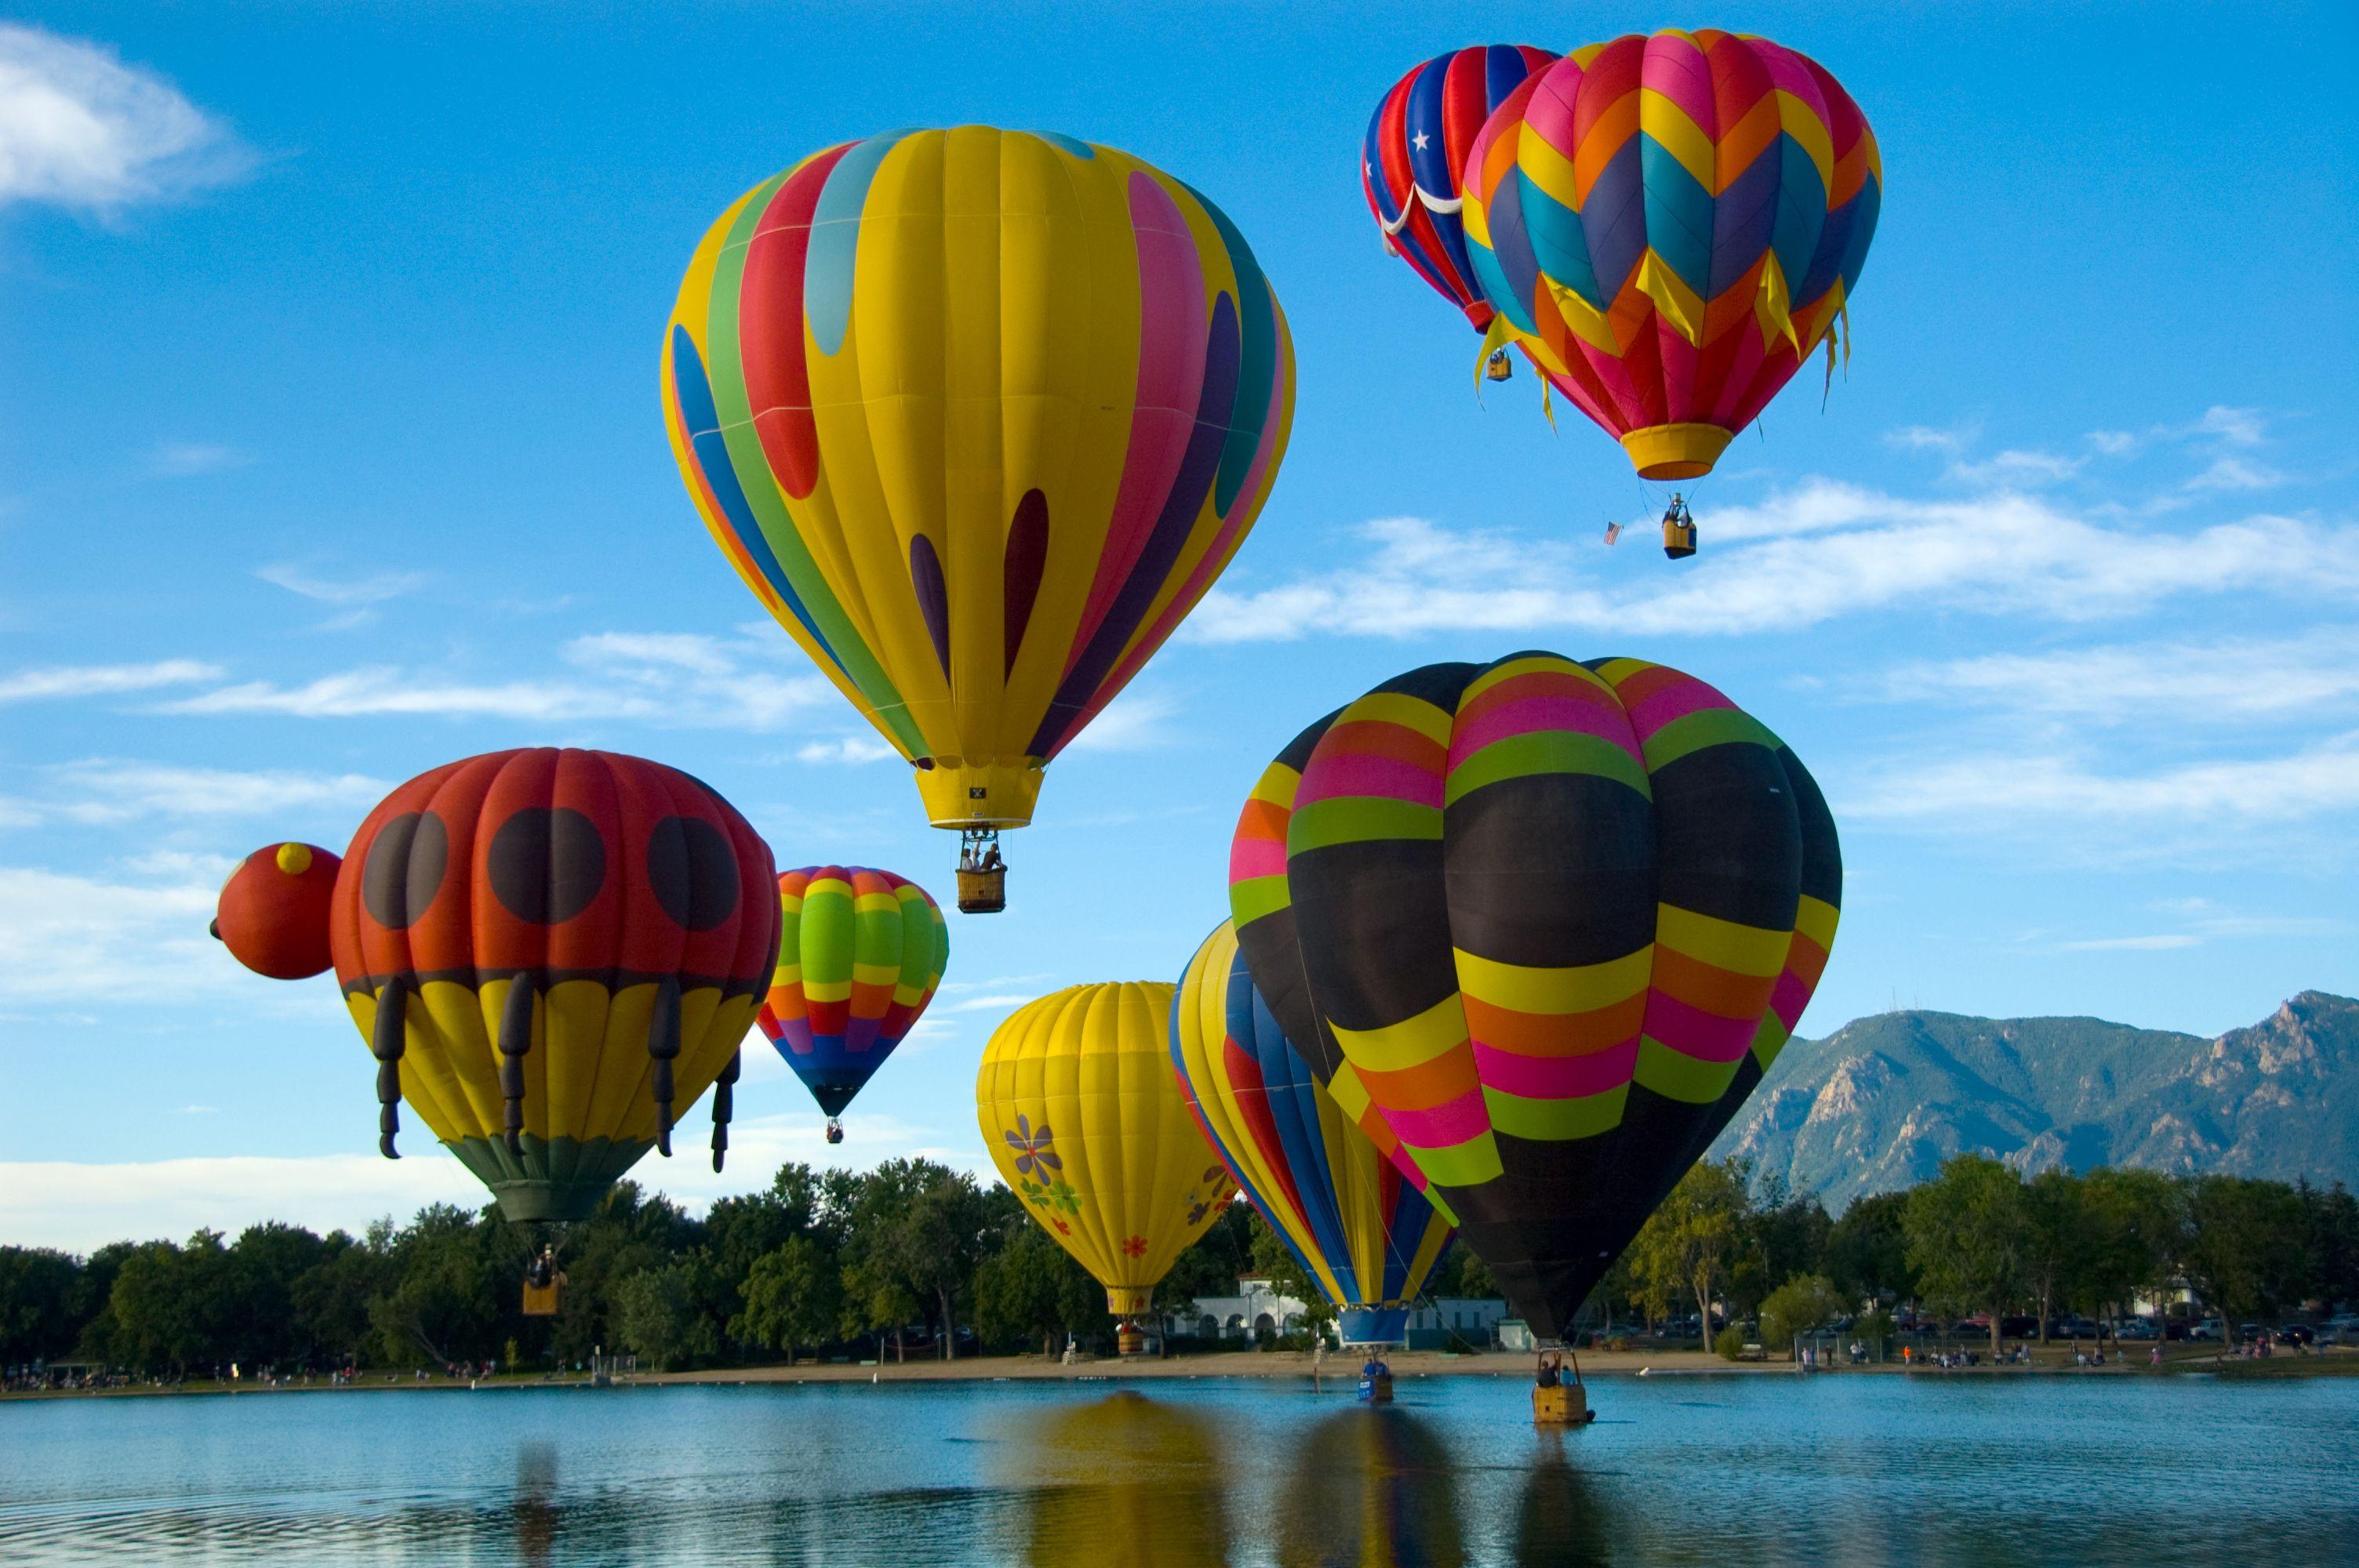 Hot air balloons Colorado Springs Labor Day weekend